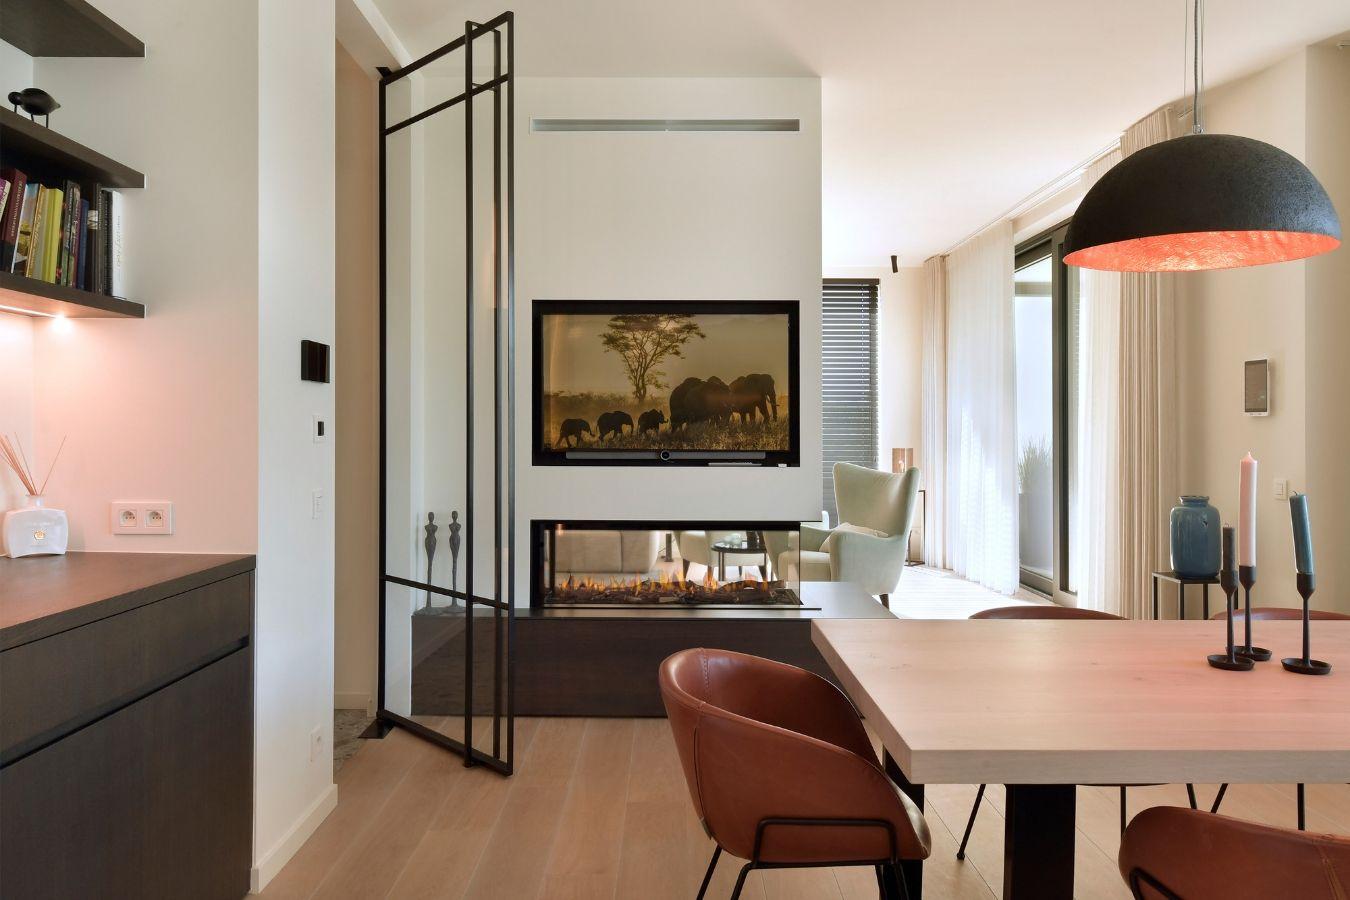 stalen deur met glas met deurgreep op volledige lengte, pivotdeur, stalen deur, project Turnhout, stalen deuren gerealiseerd door StalenDeurenHuys